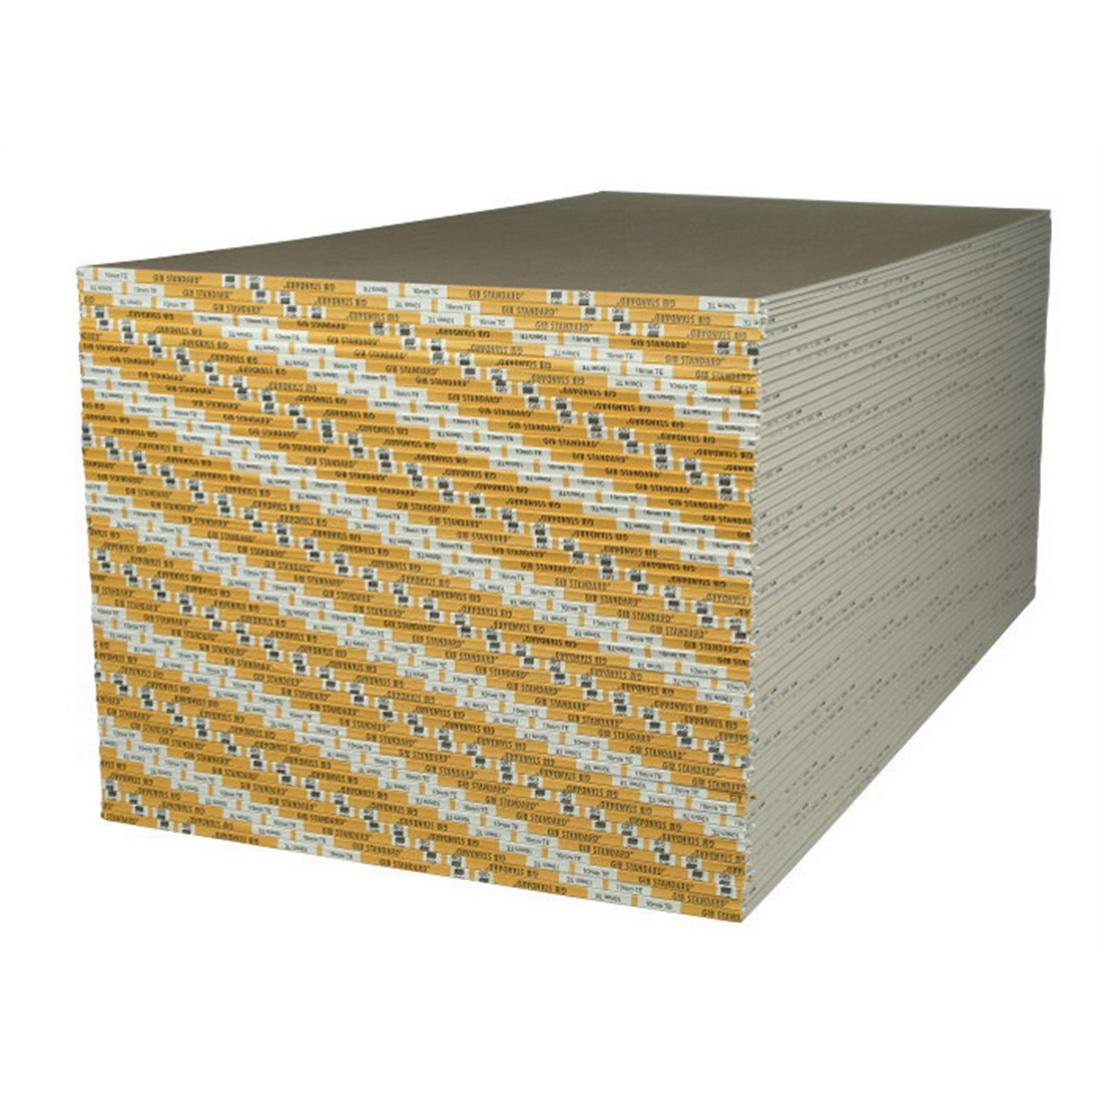 Standard Wallboard 3600 x 1200 x 10mm Yellow Face Paper Gypsum 11540